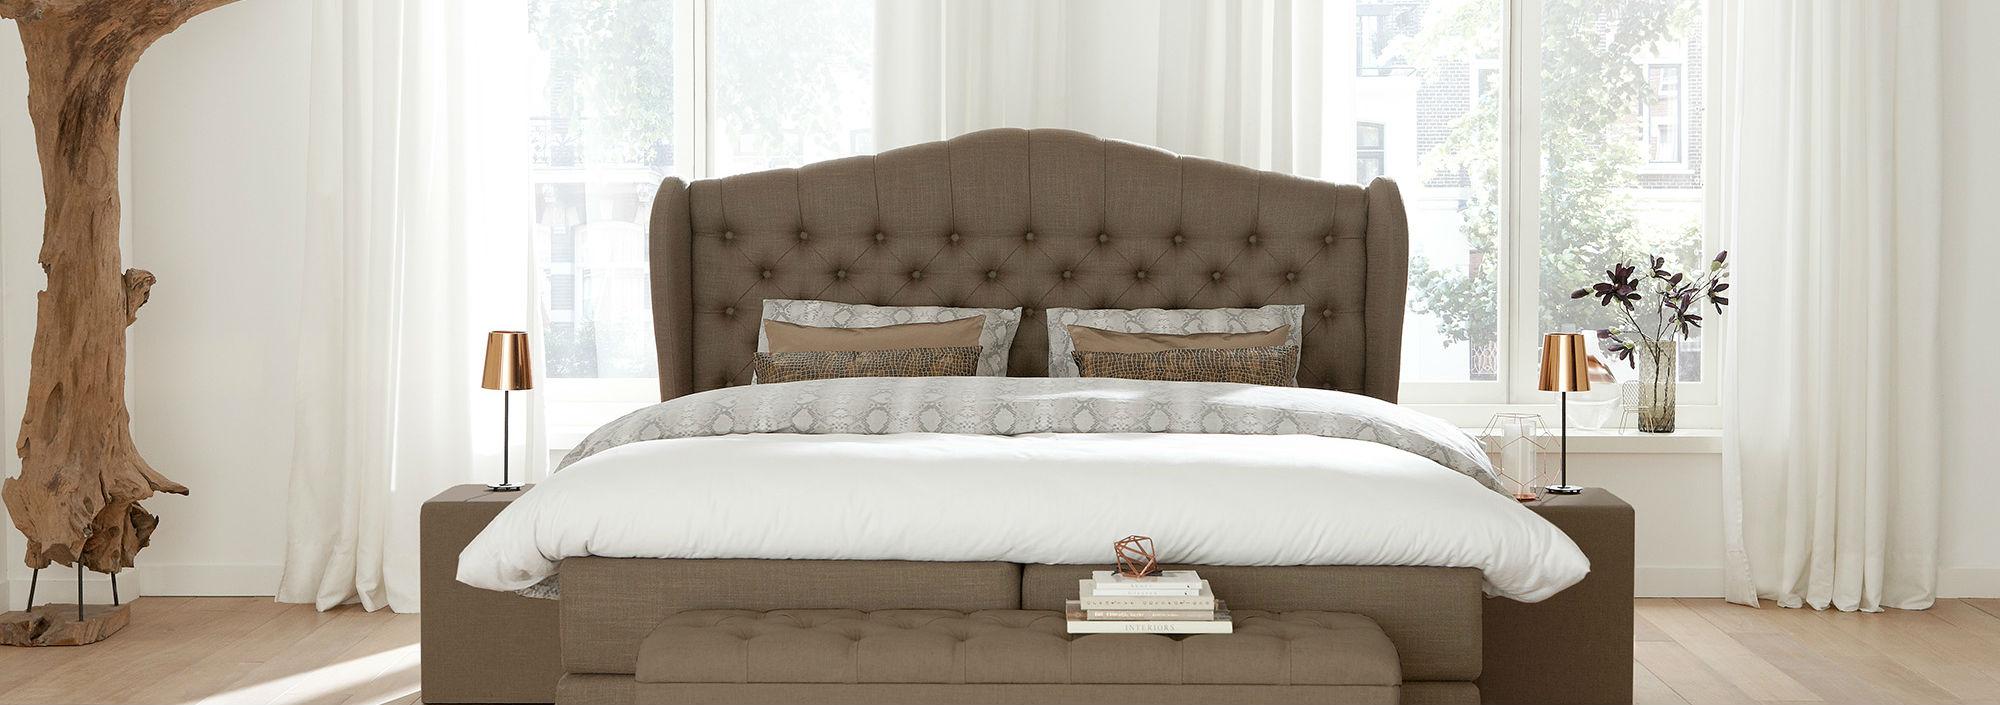 Amerikanische Betten - Banner